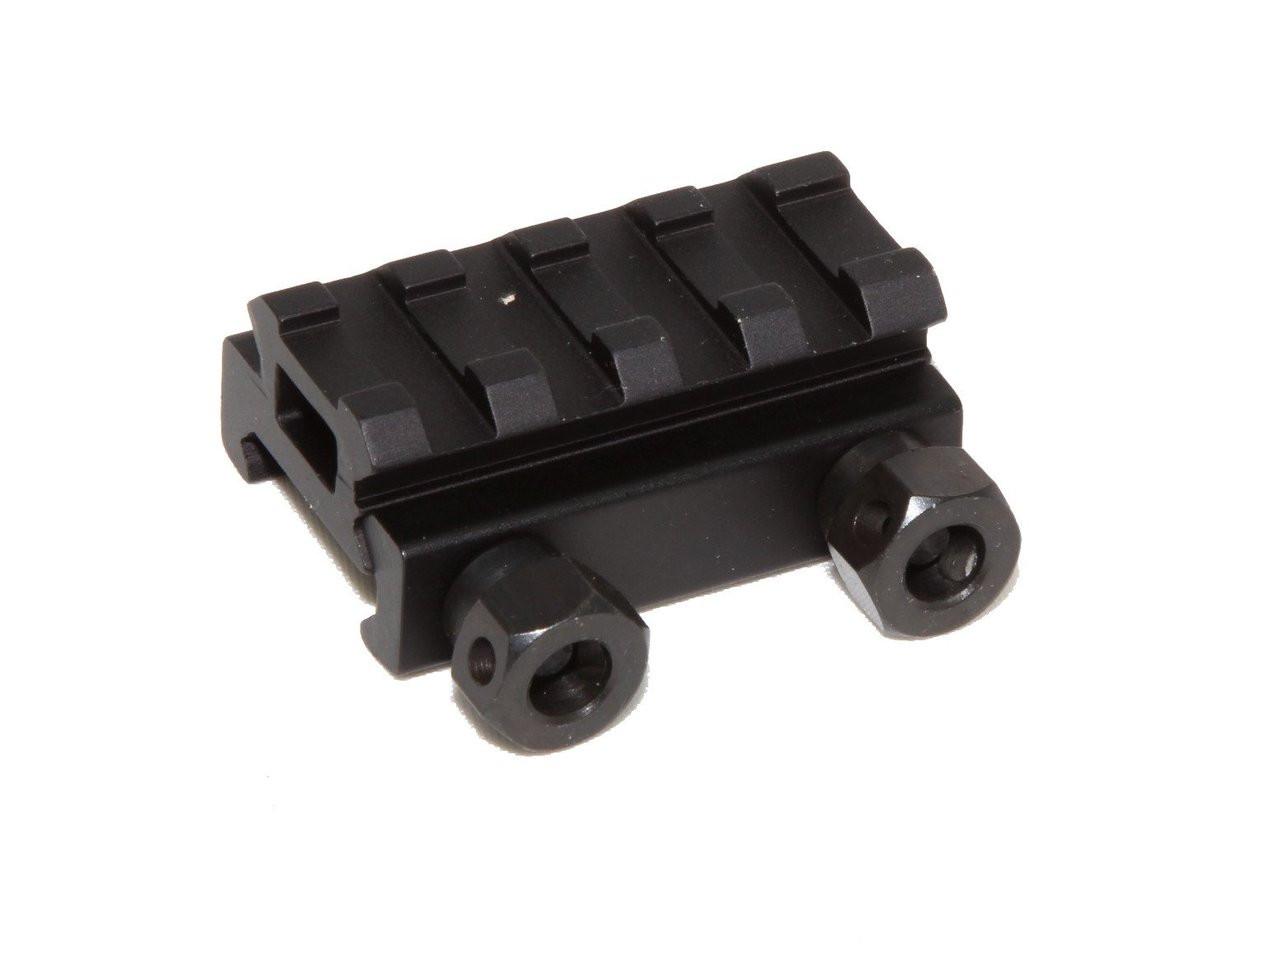 "1//2 /""3 Slot Low Weaver//Picatinny Rail Riser For Elevating Scope Sights 20mm Base"